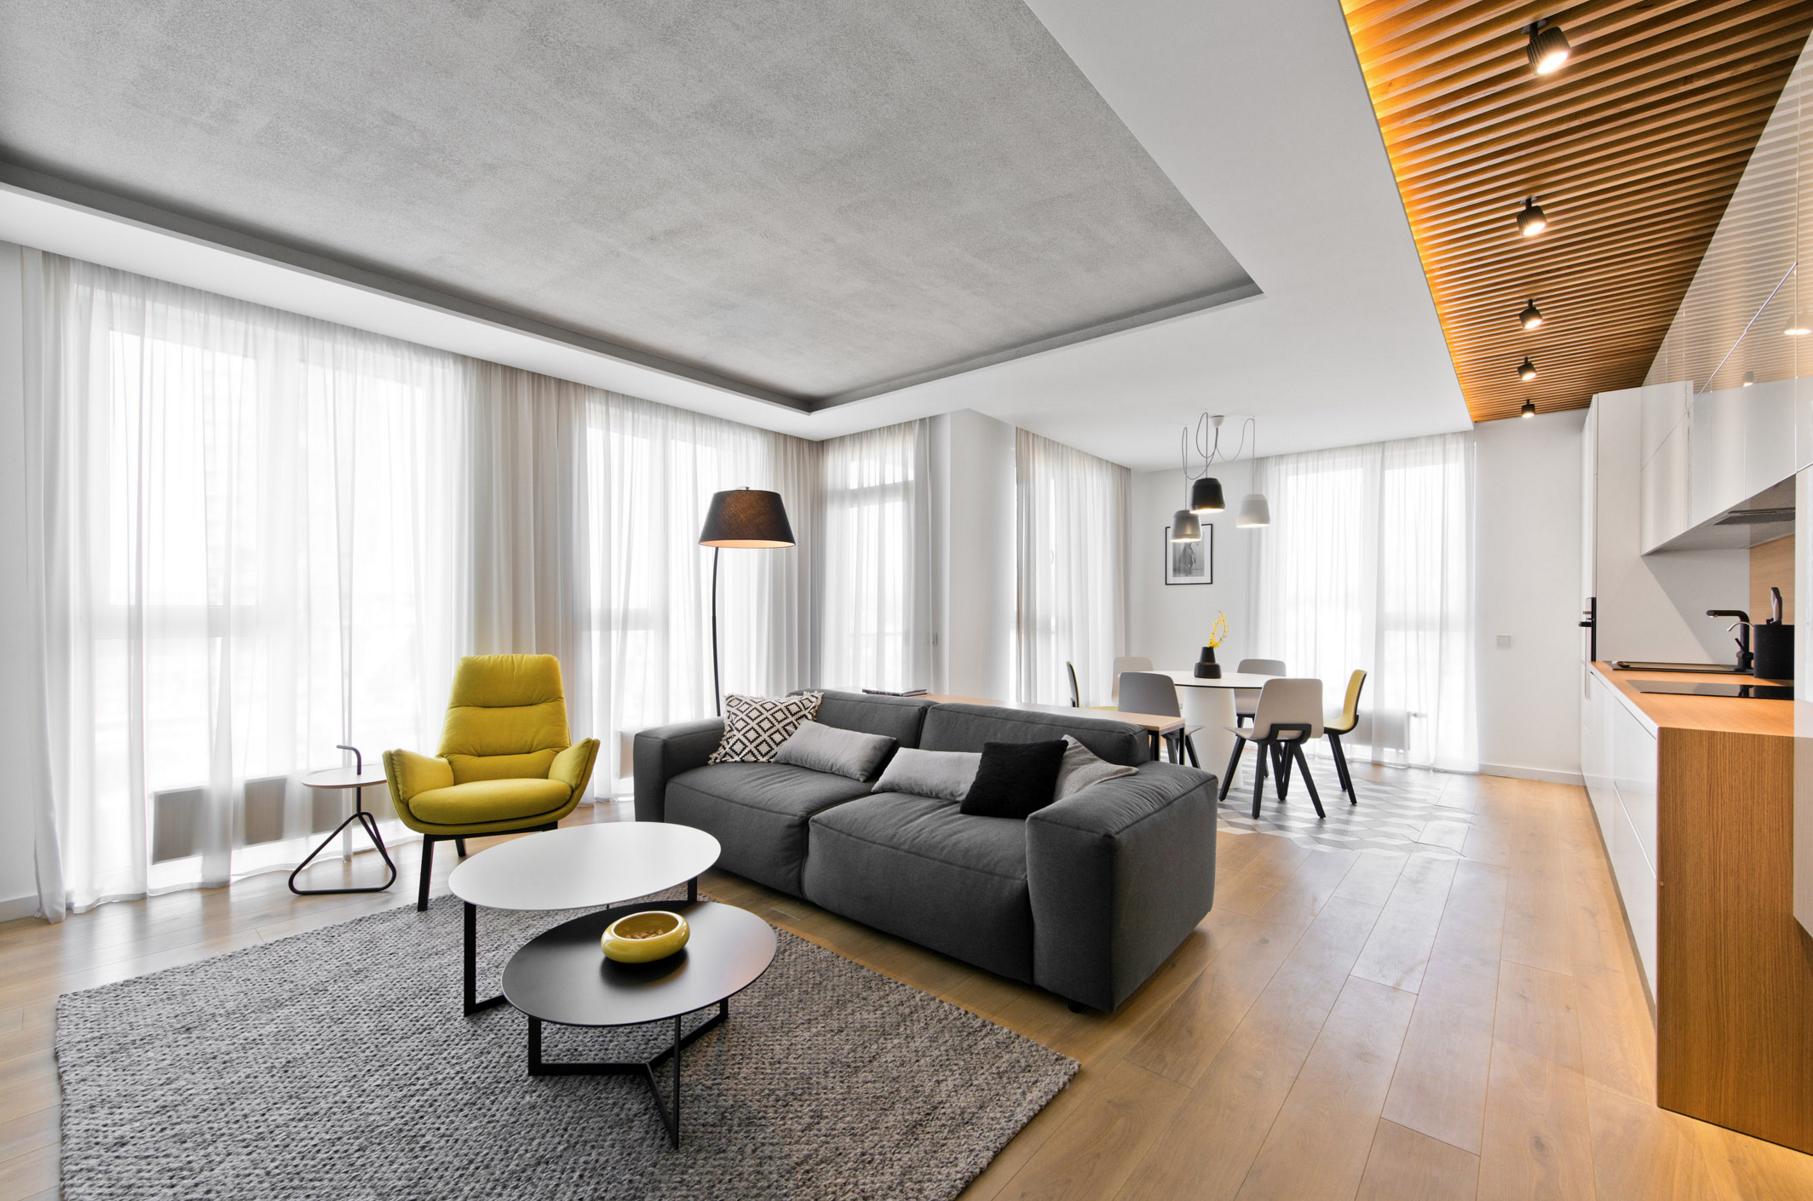 inarch apartment vilnius7 Apartments in Vilnius by Inarch